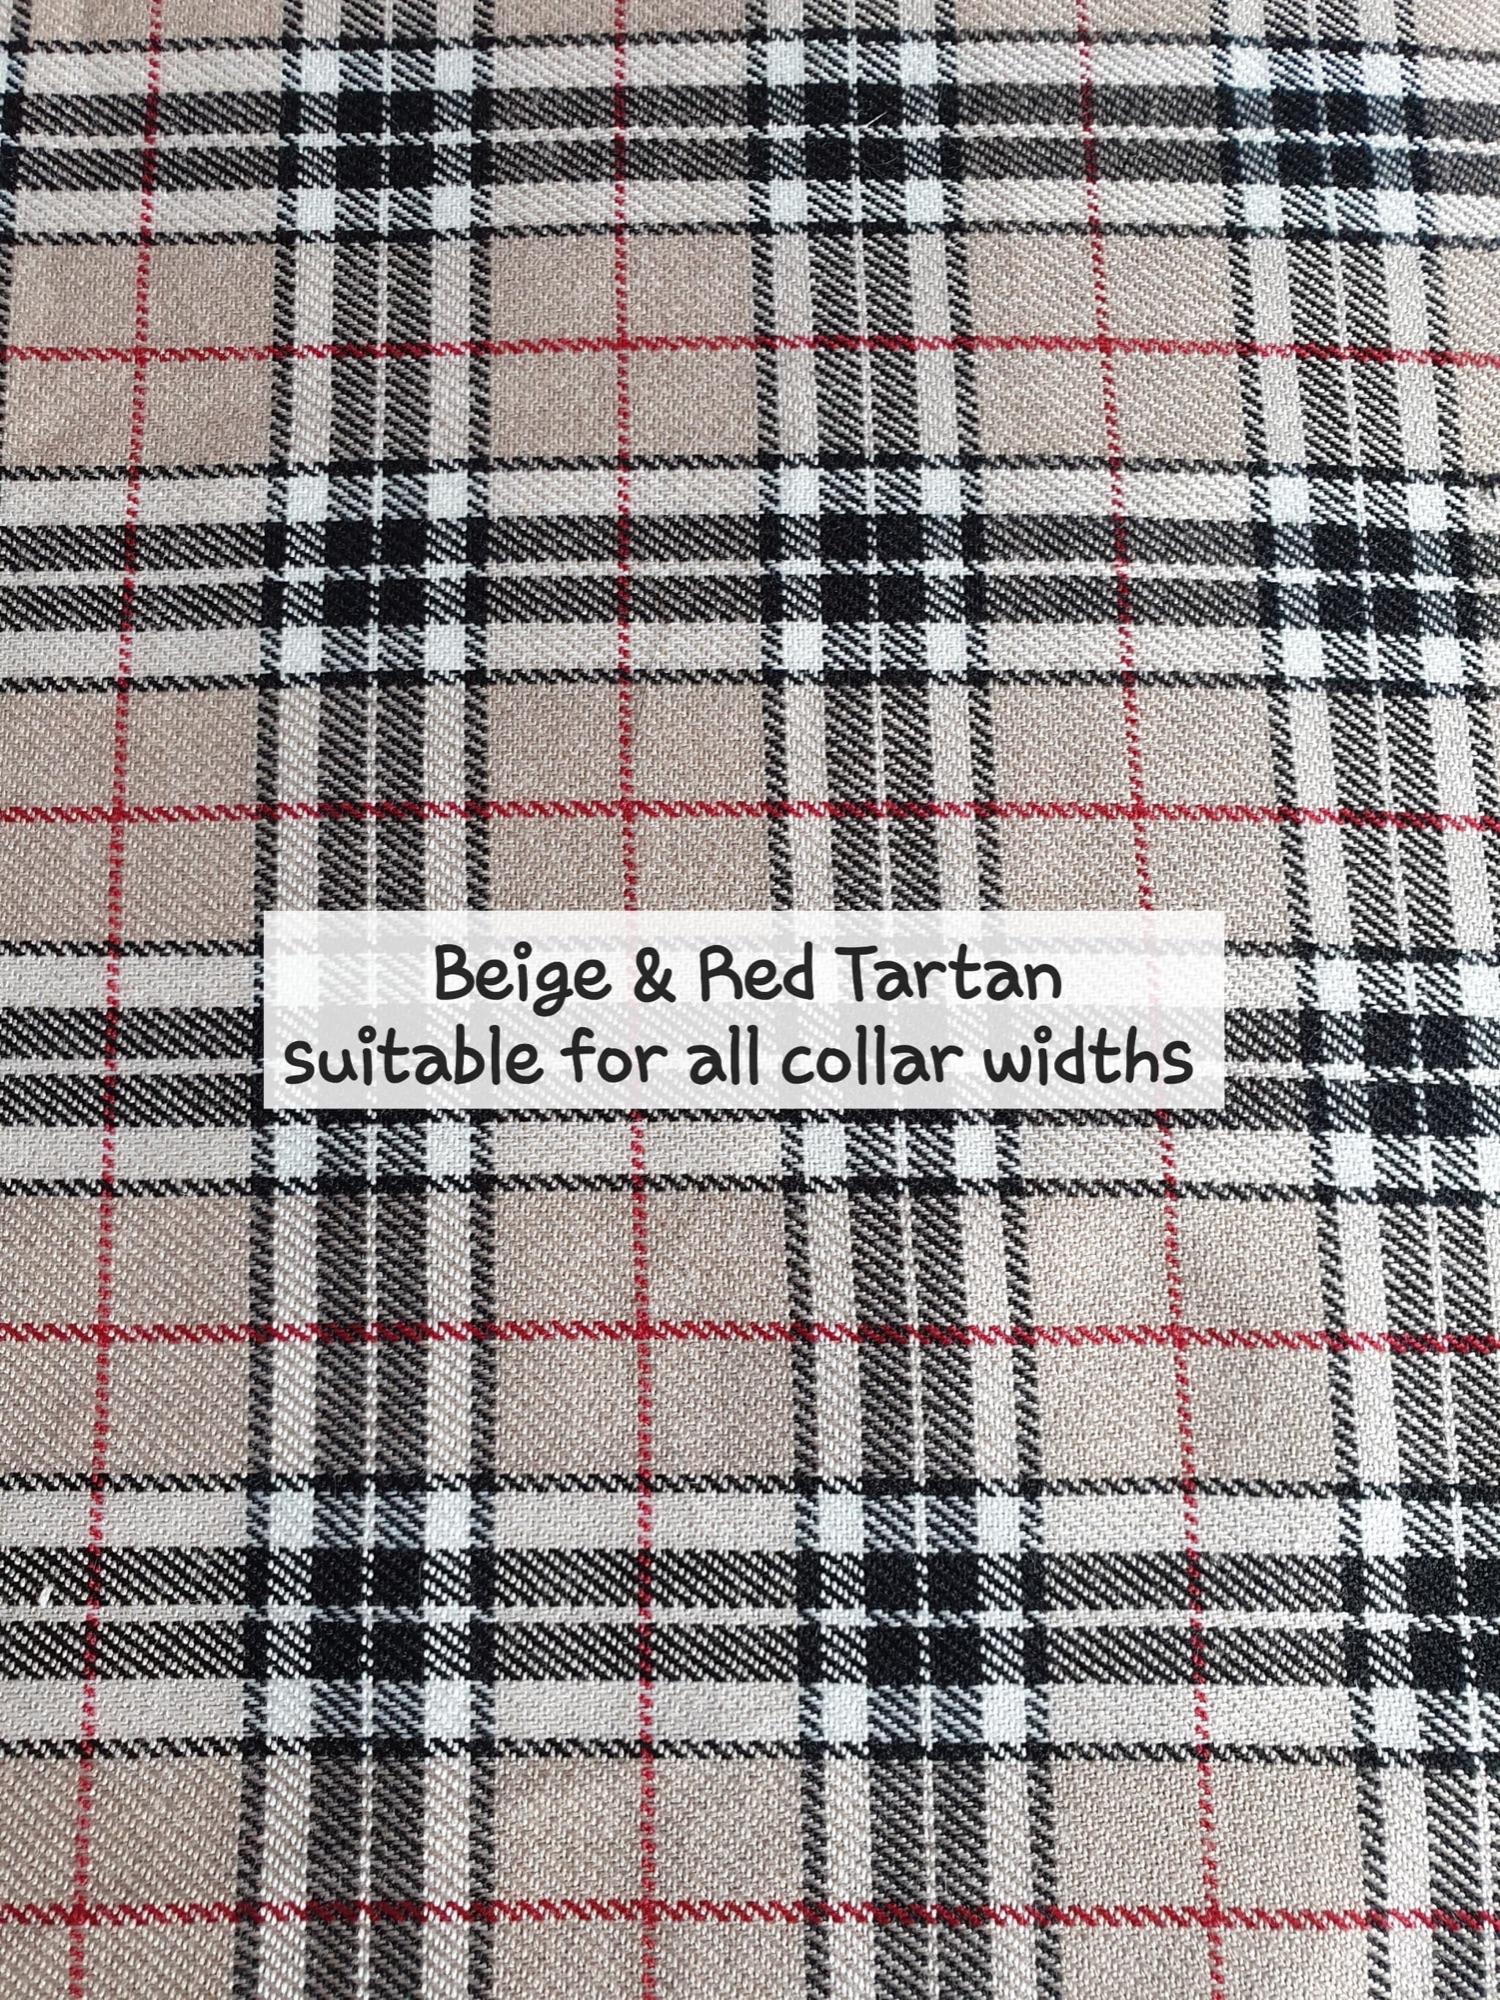 Beige & Red Tartan